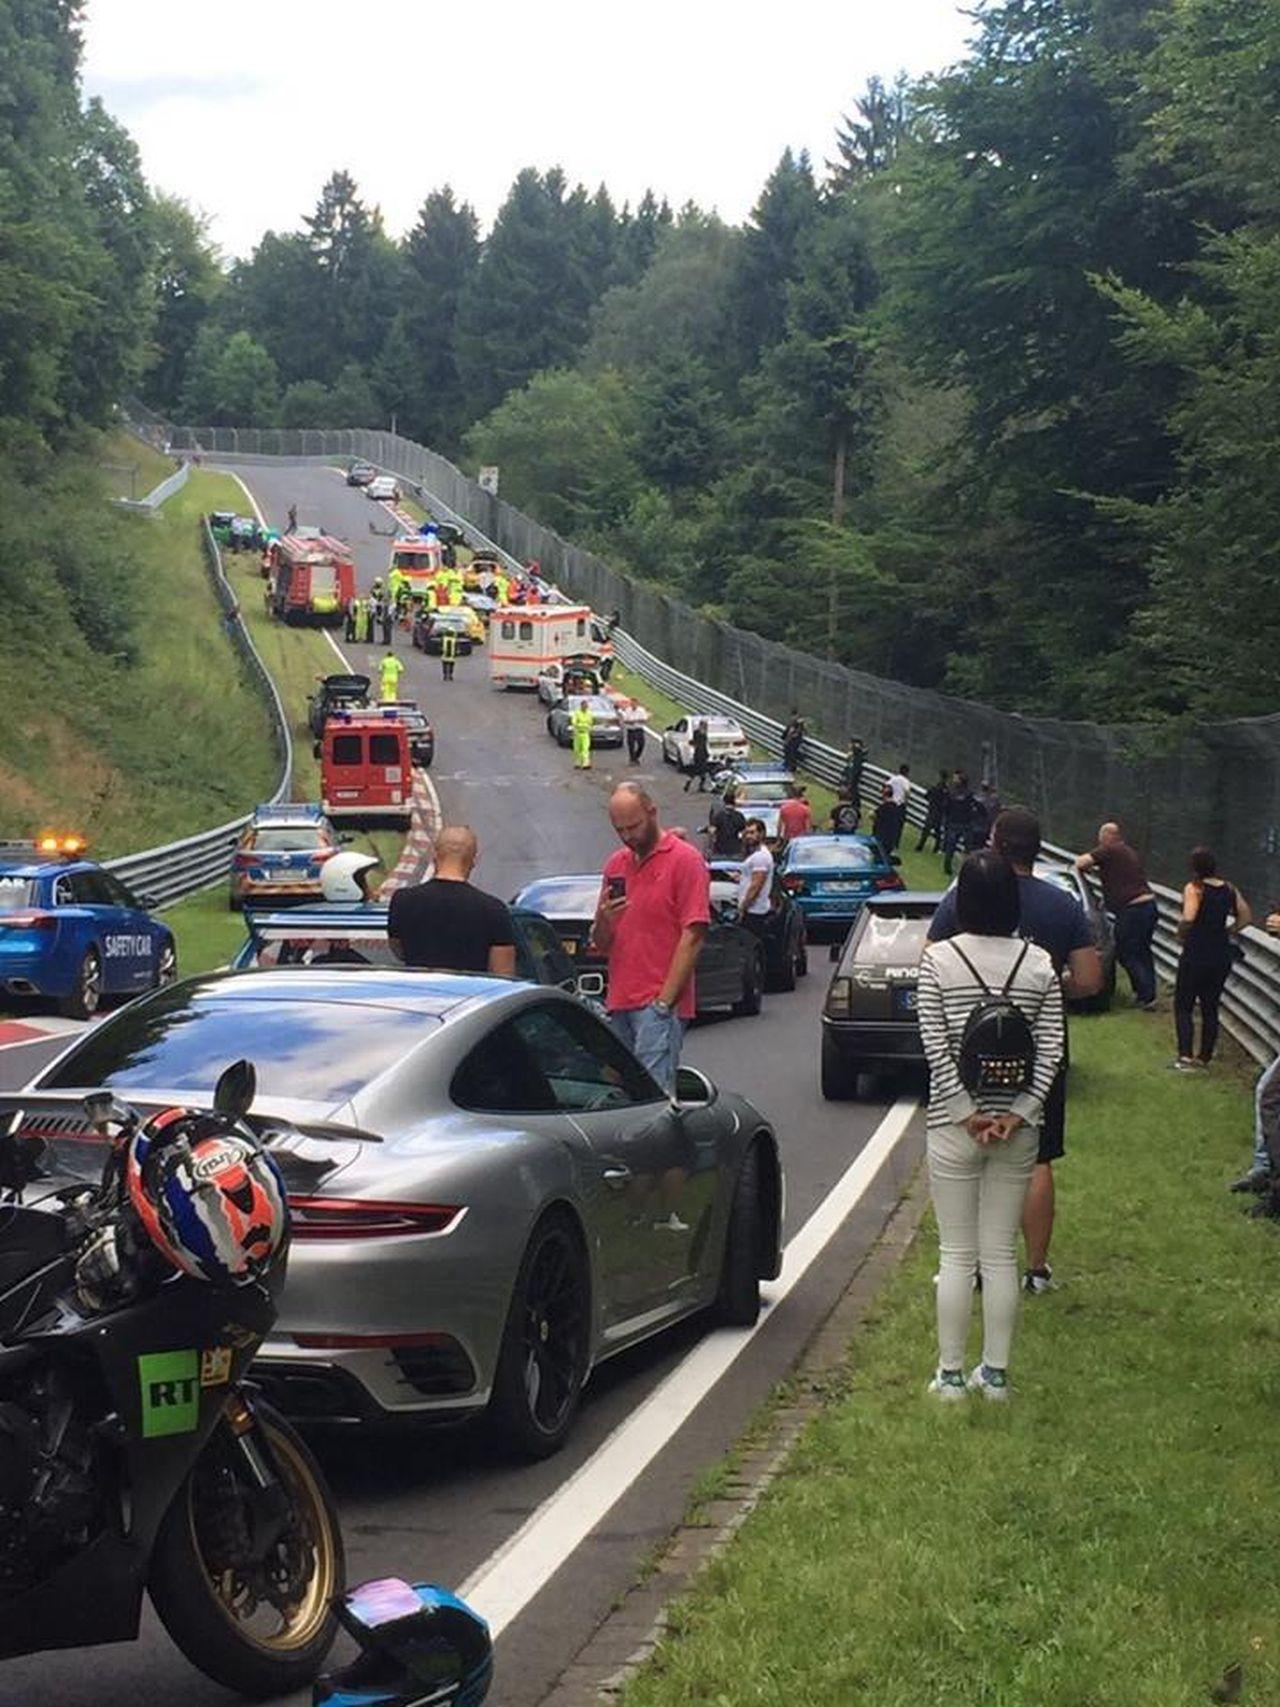 Nurburgring crash august 2017 (14)